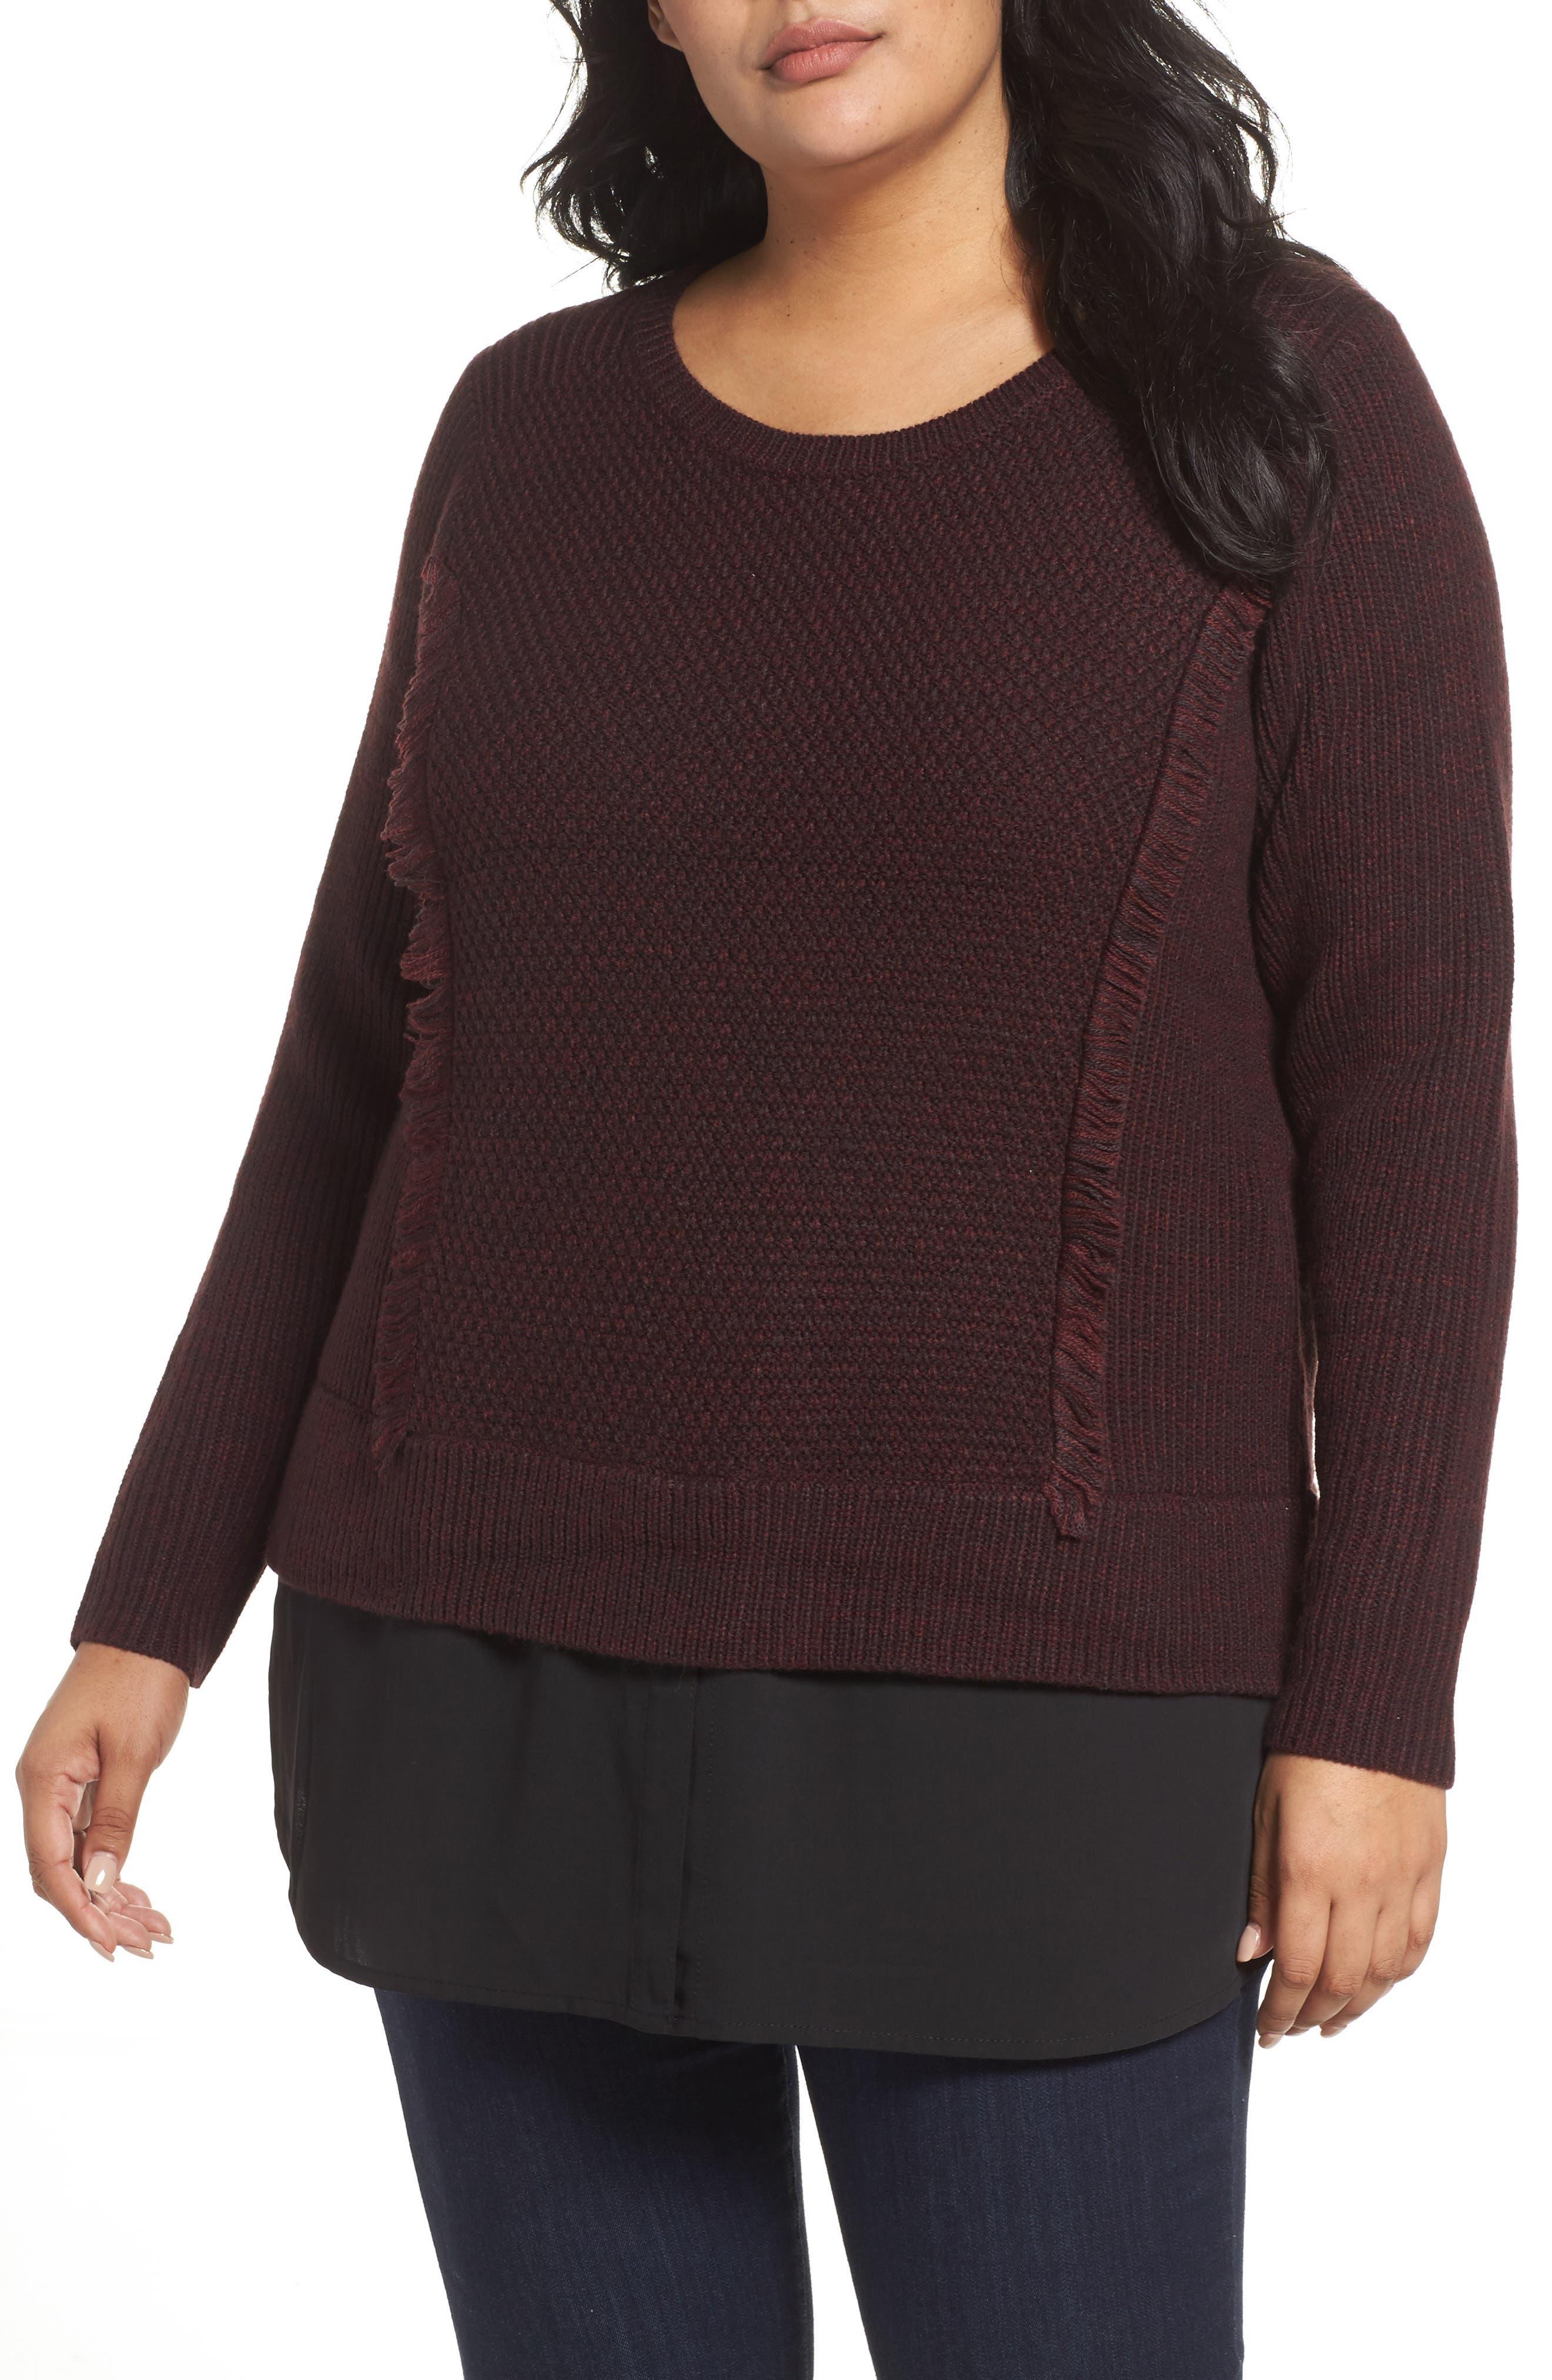 Main Image - Foxcroft Sophia Layered Look Sweater (Plus Size)